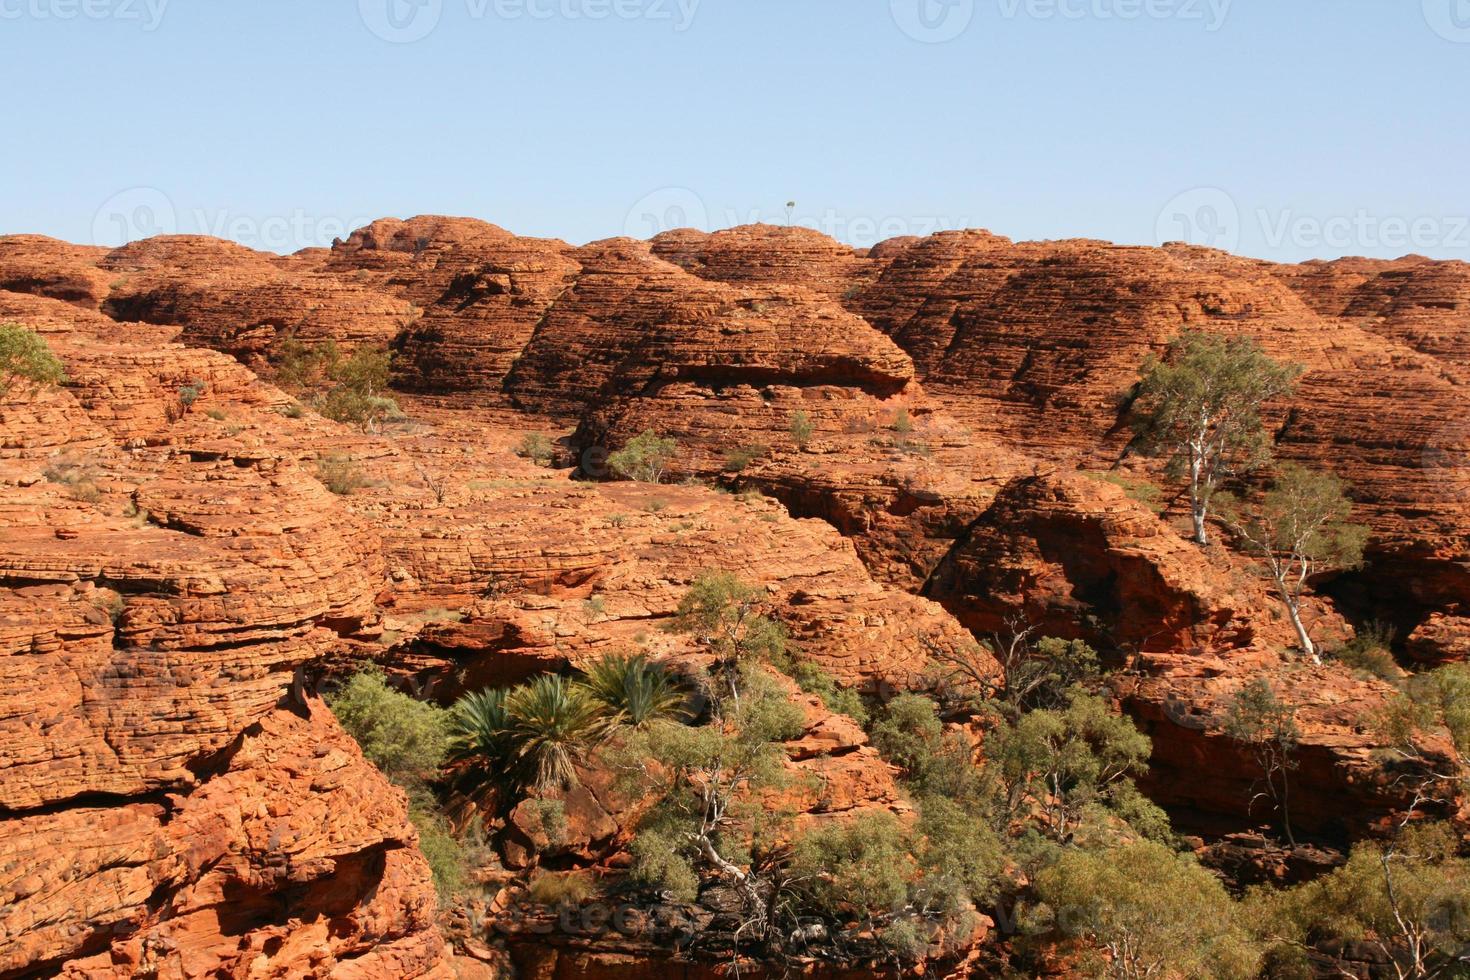 Kings canyon national park, Australia photo